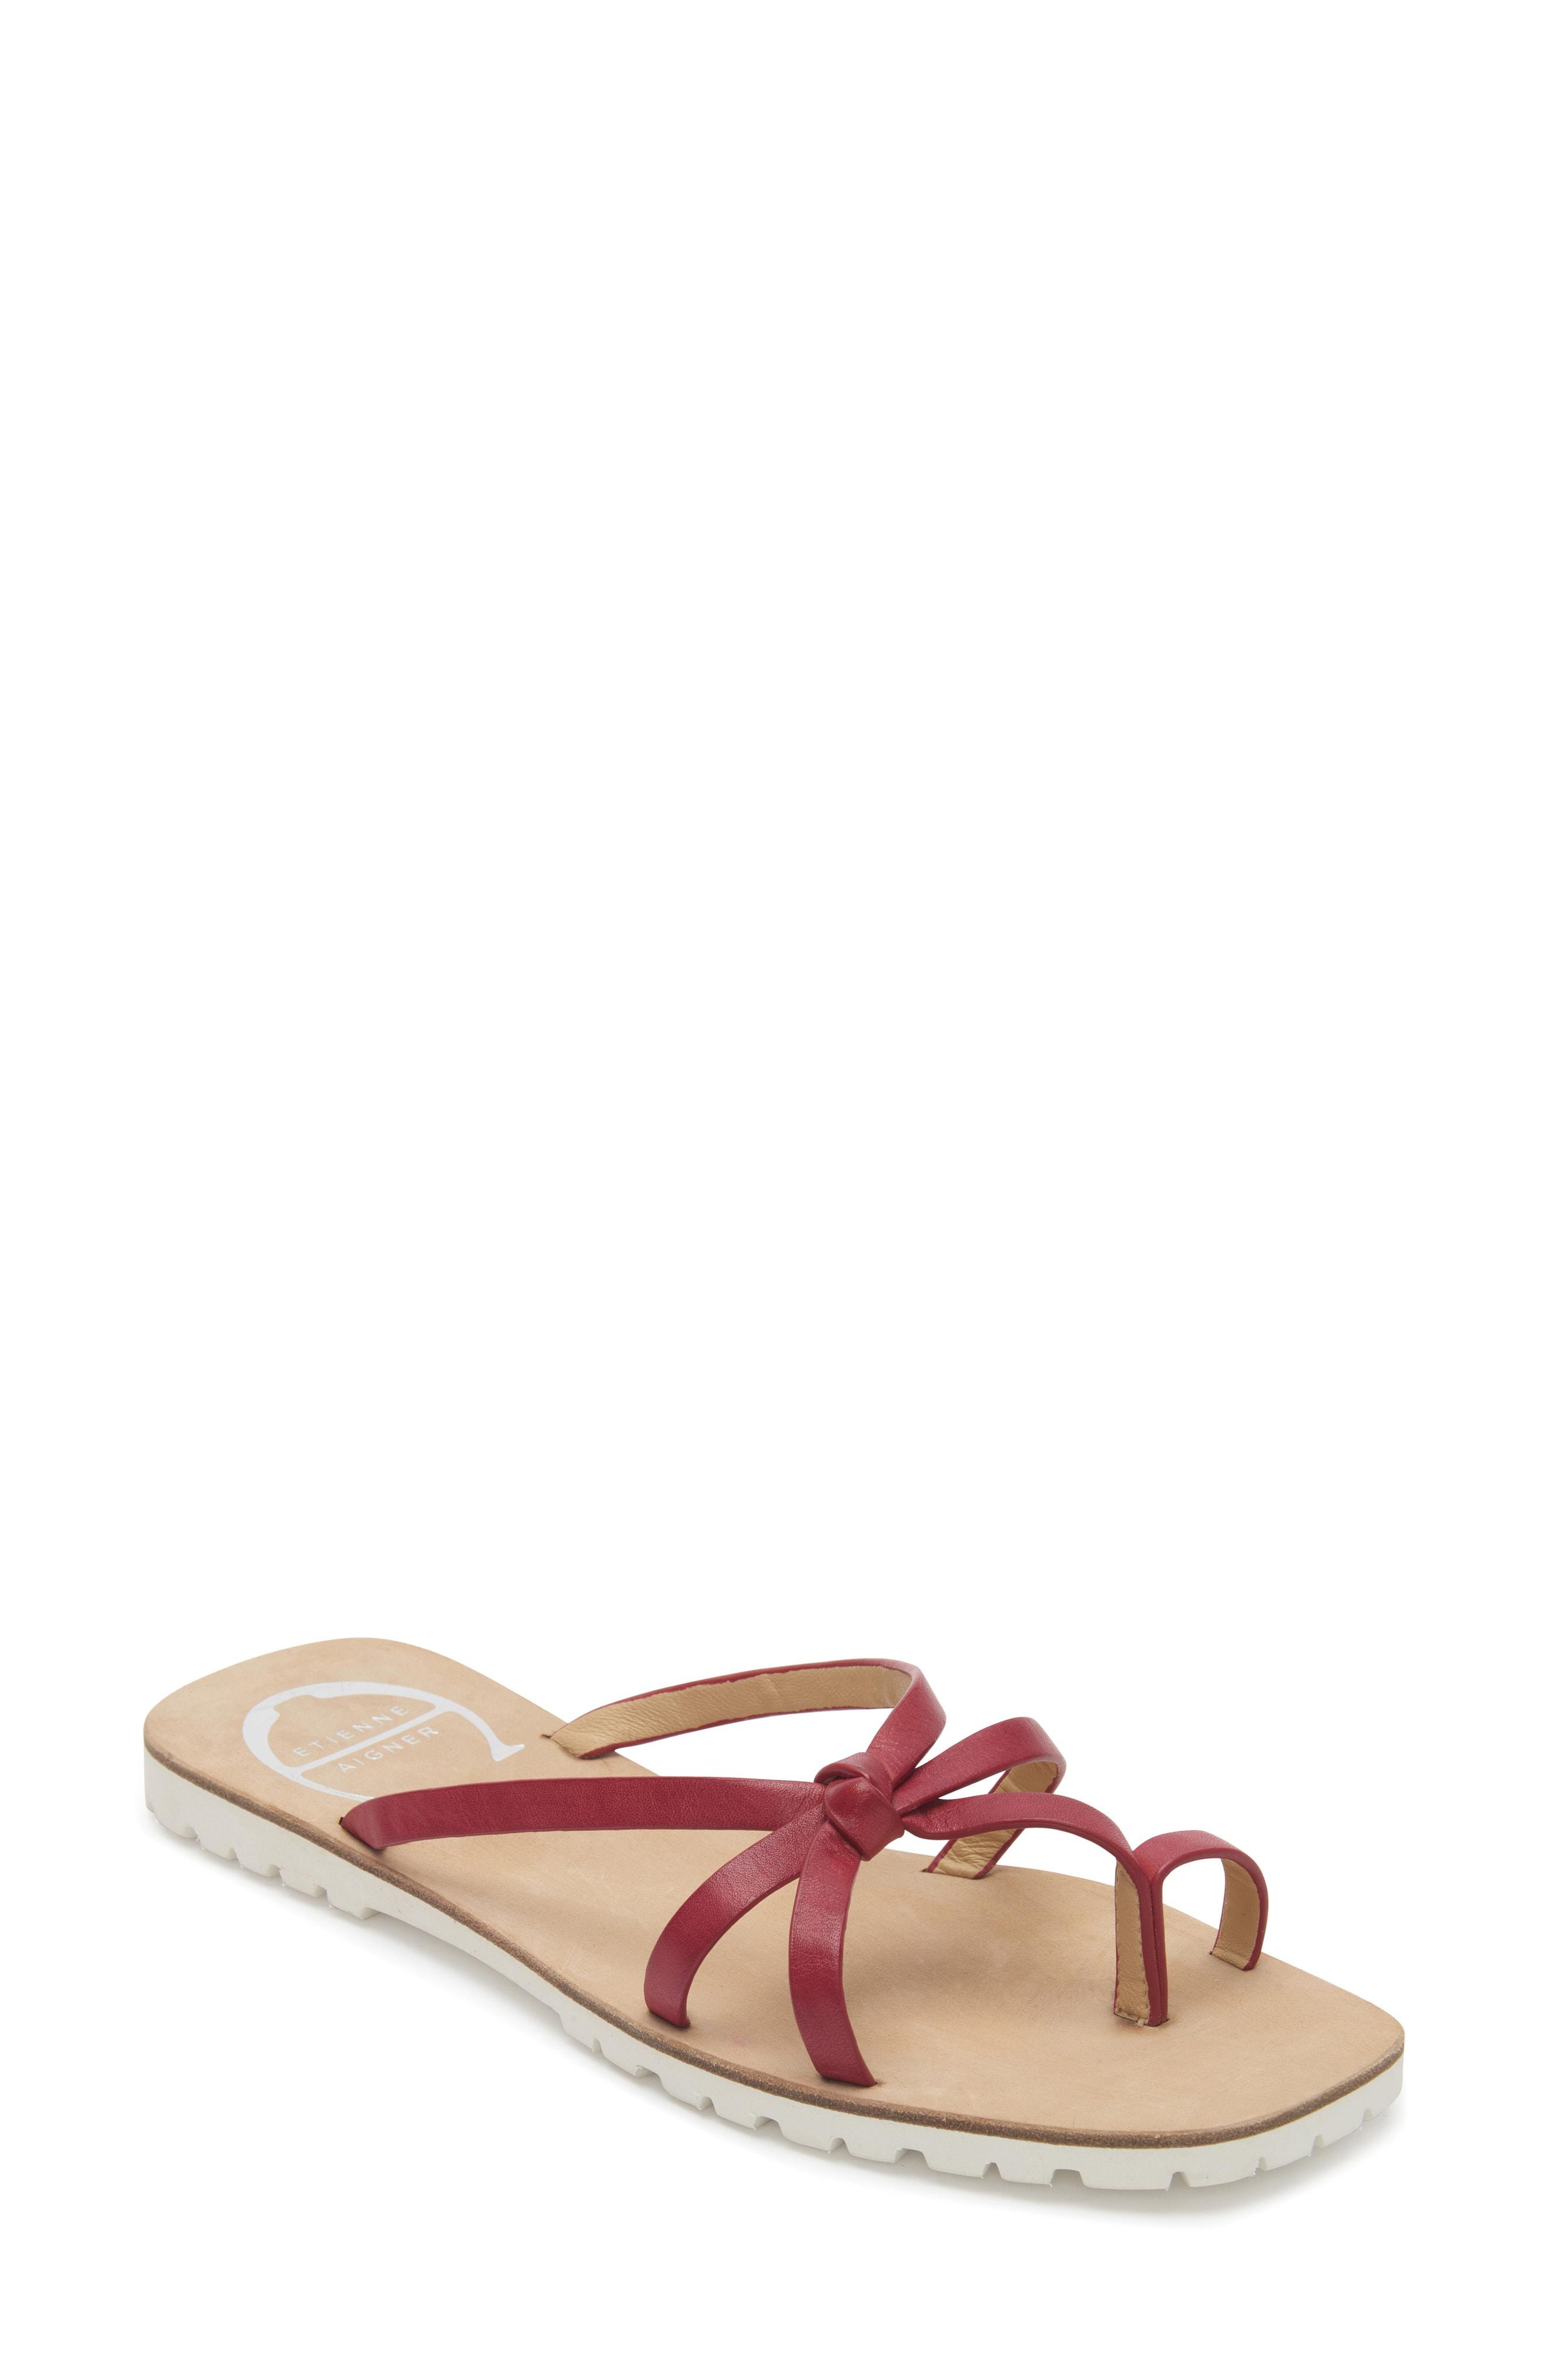 73f227867956 Etienne Aigner Malta Slide Sandal In Ruby Leather